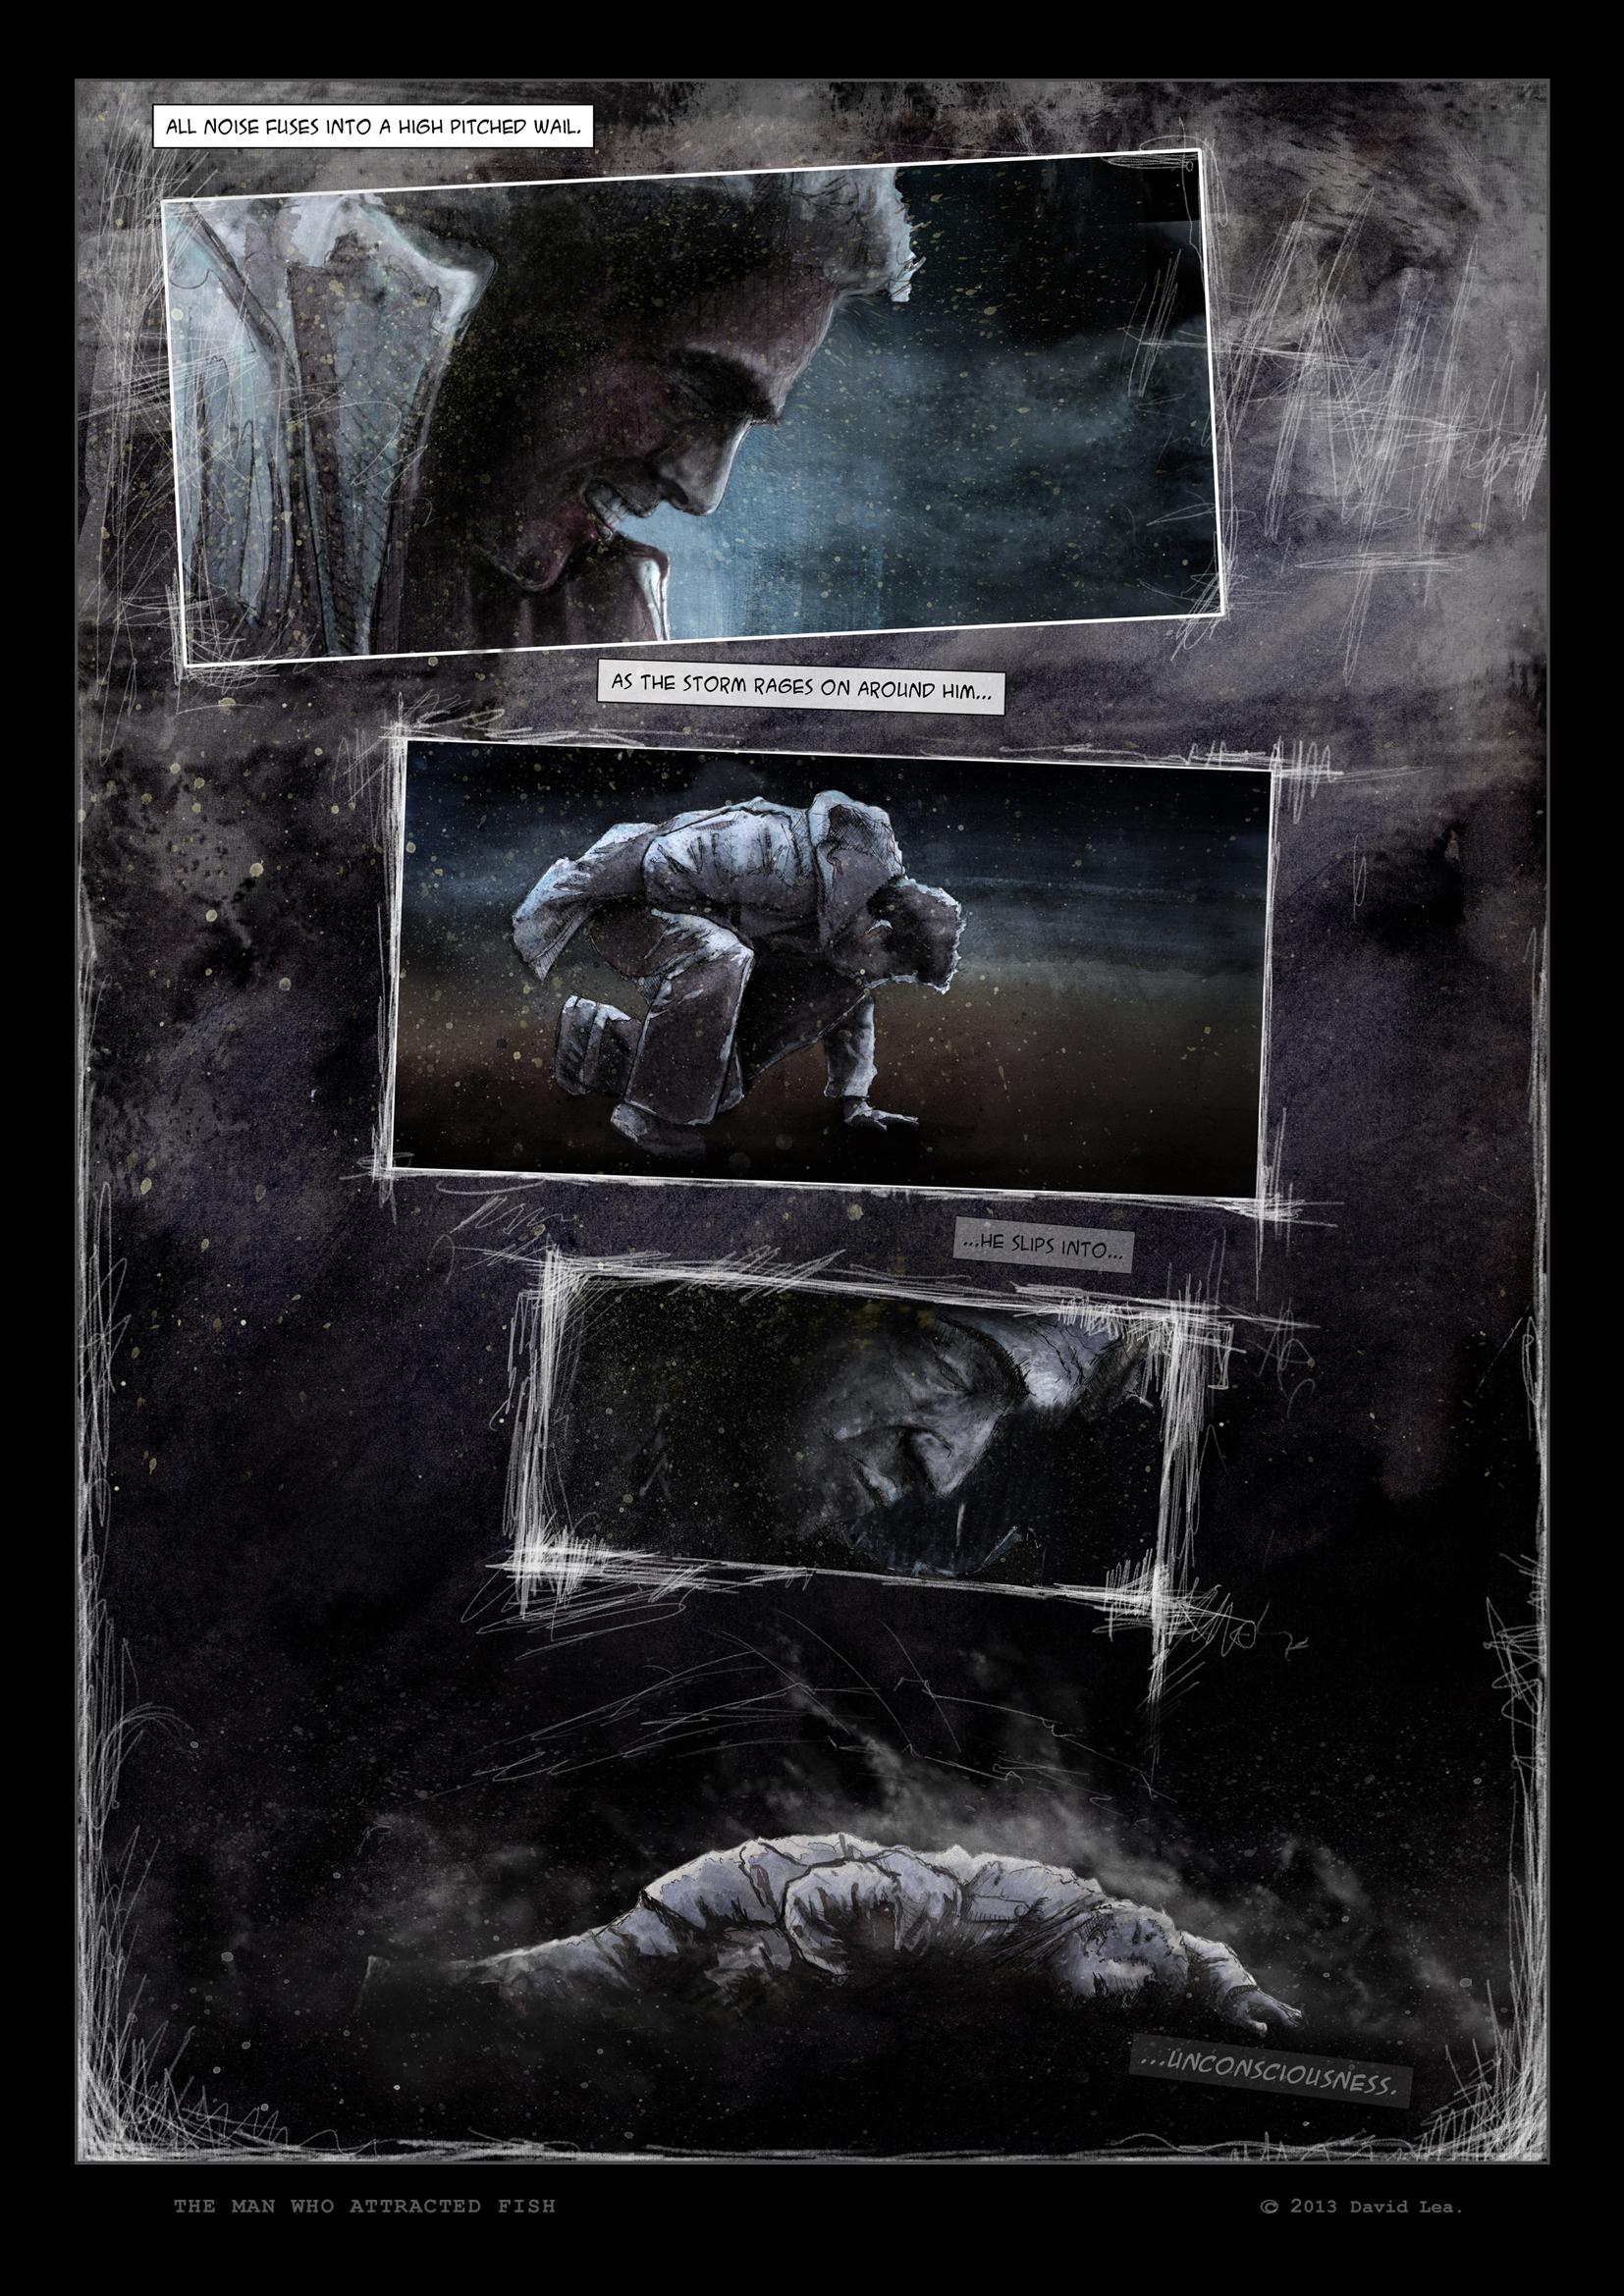 TMWAF_Graphic novel scene - page 5